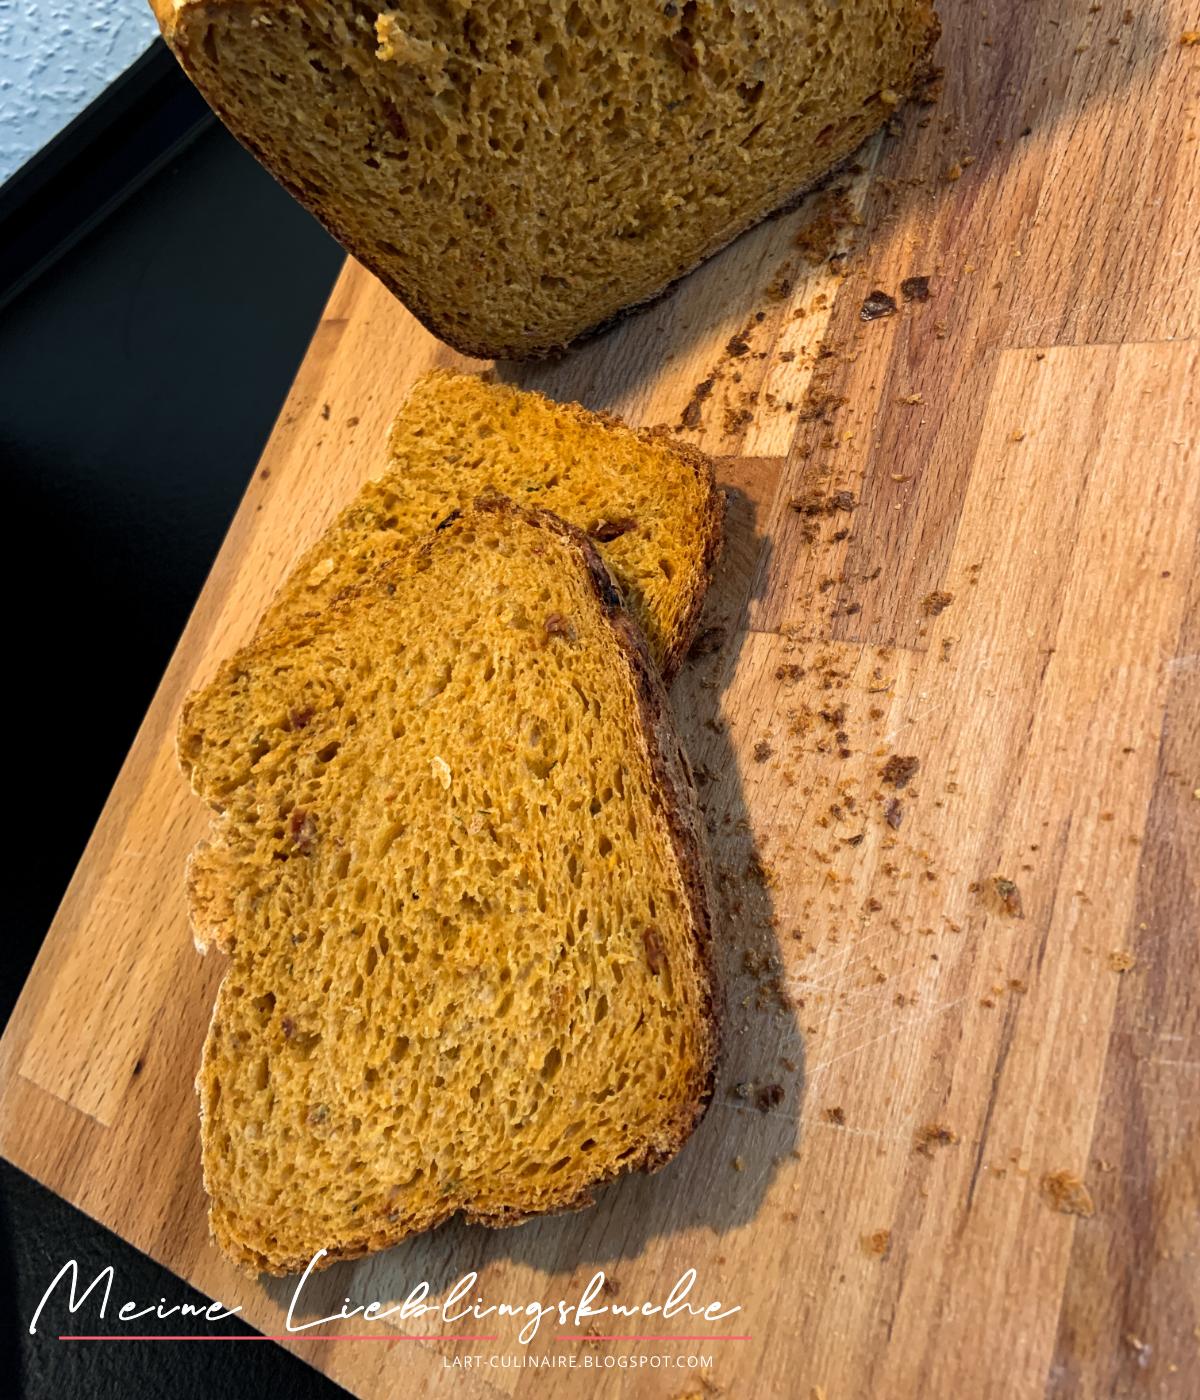 Tomaten-Brot - ideal für jede Party